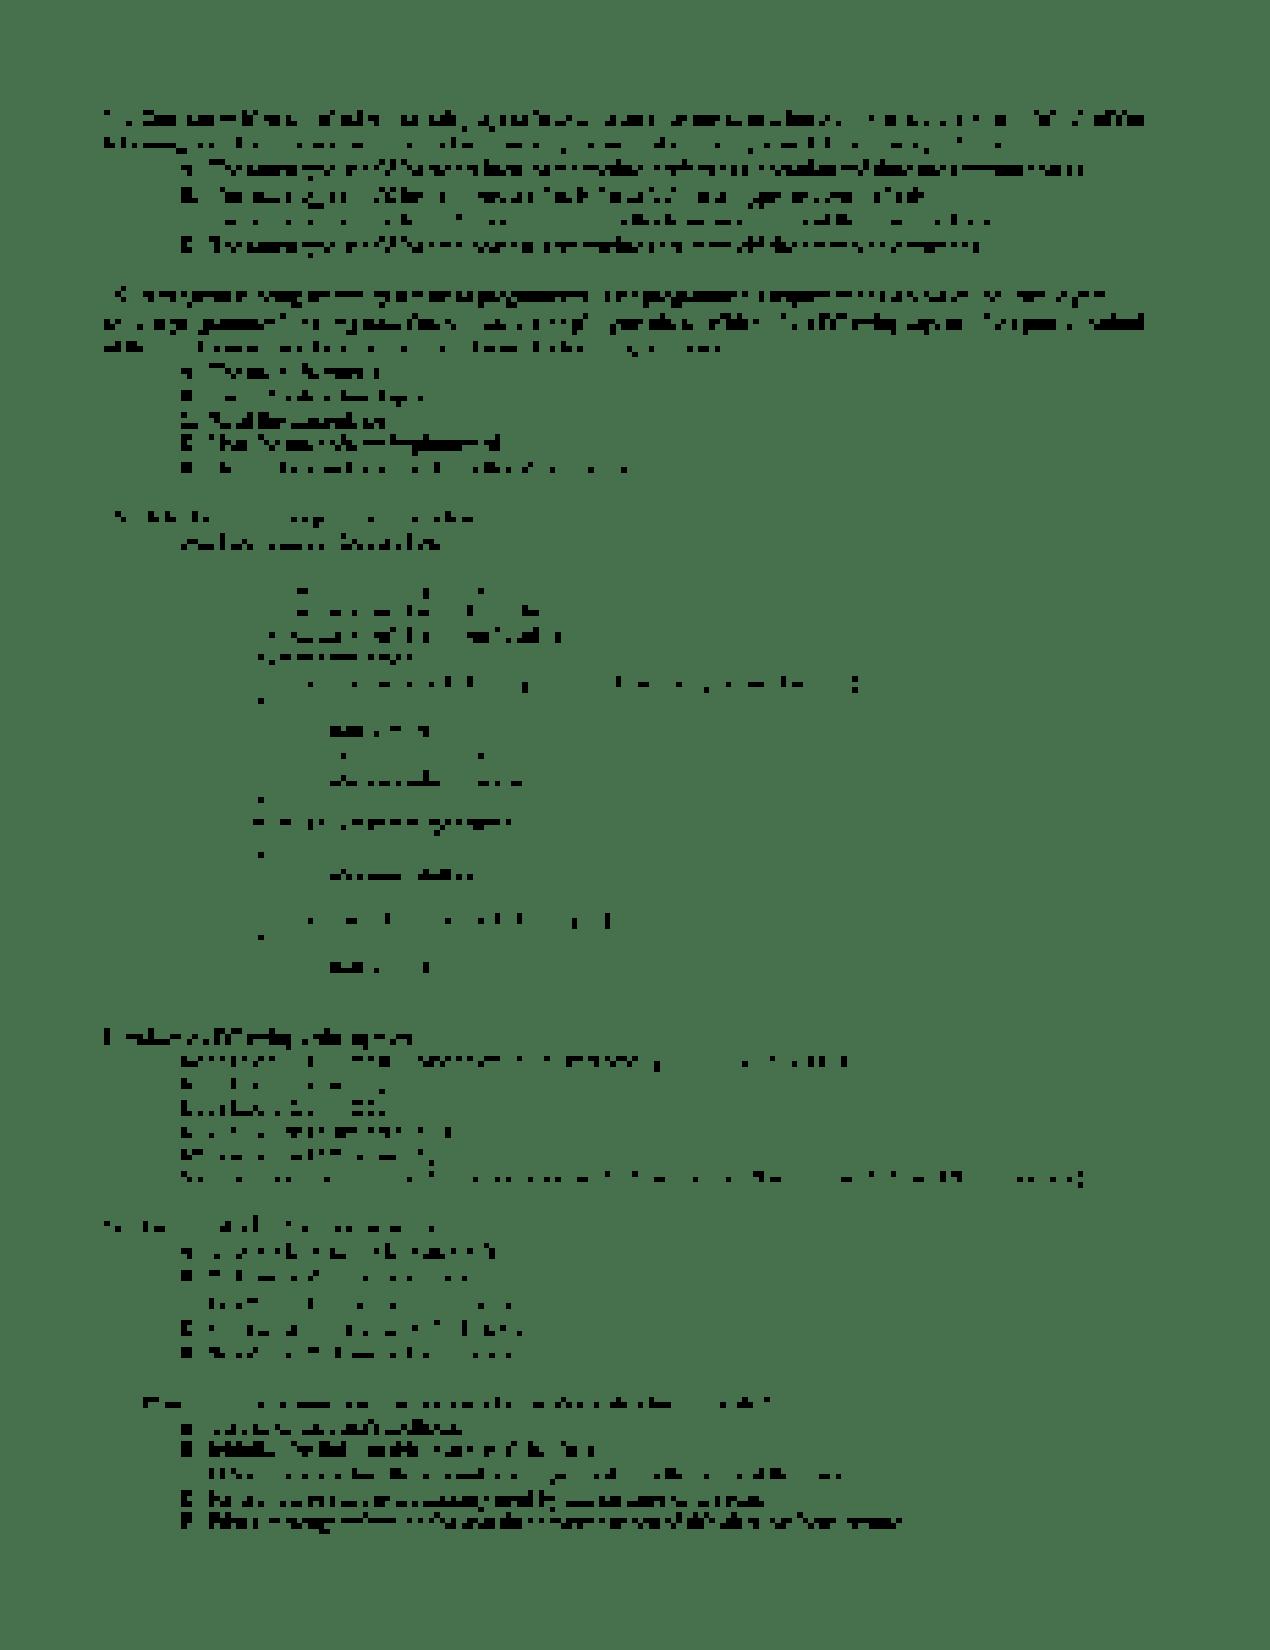 Computer science worksheets pdf